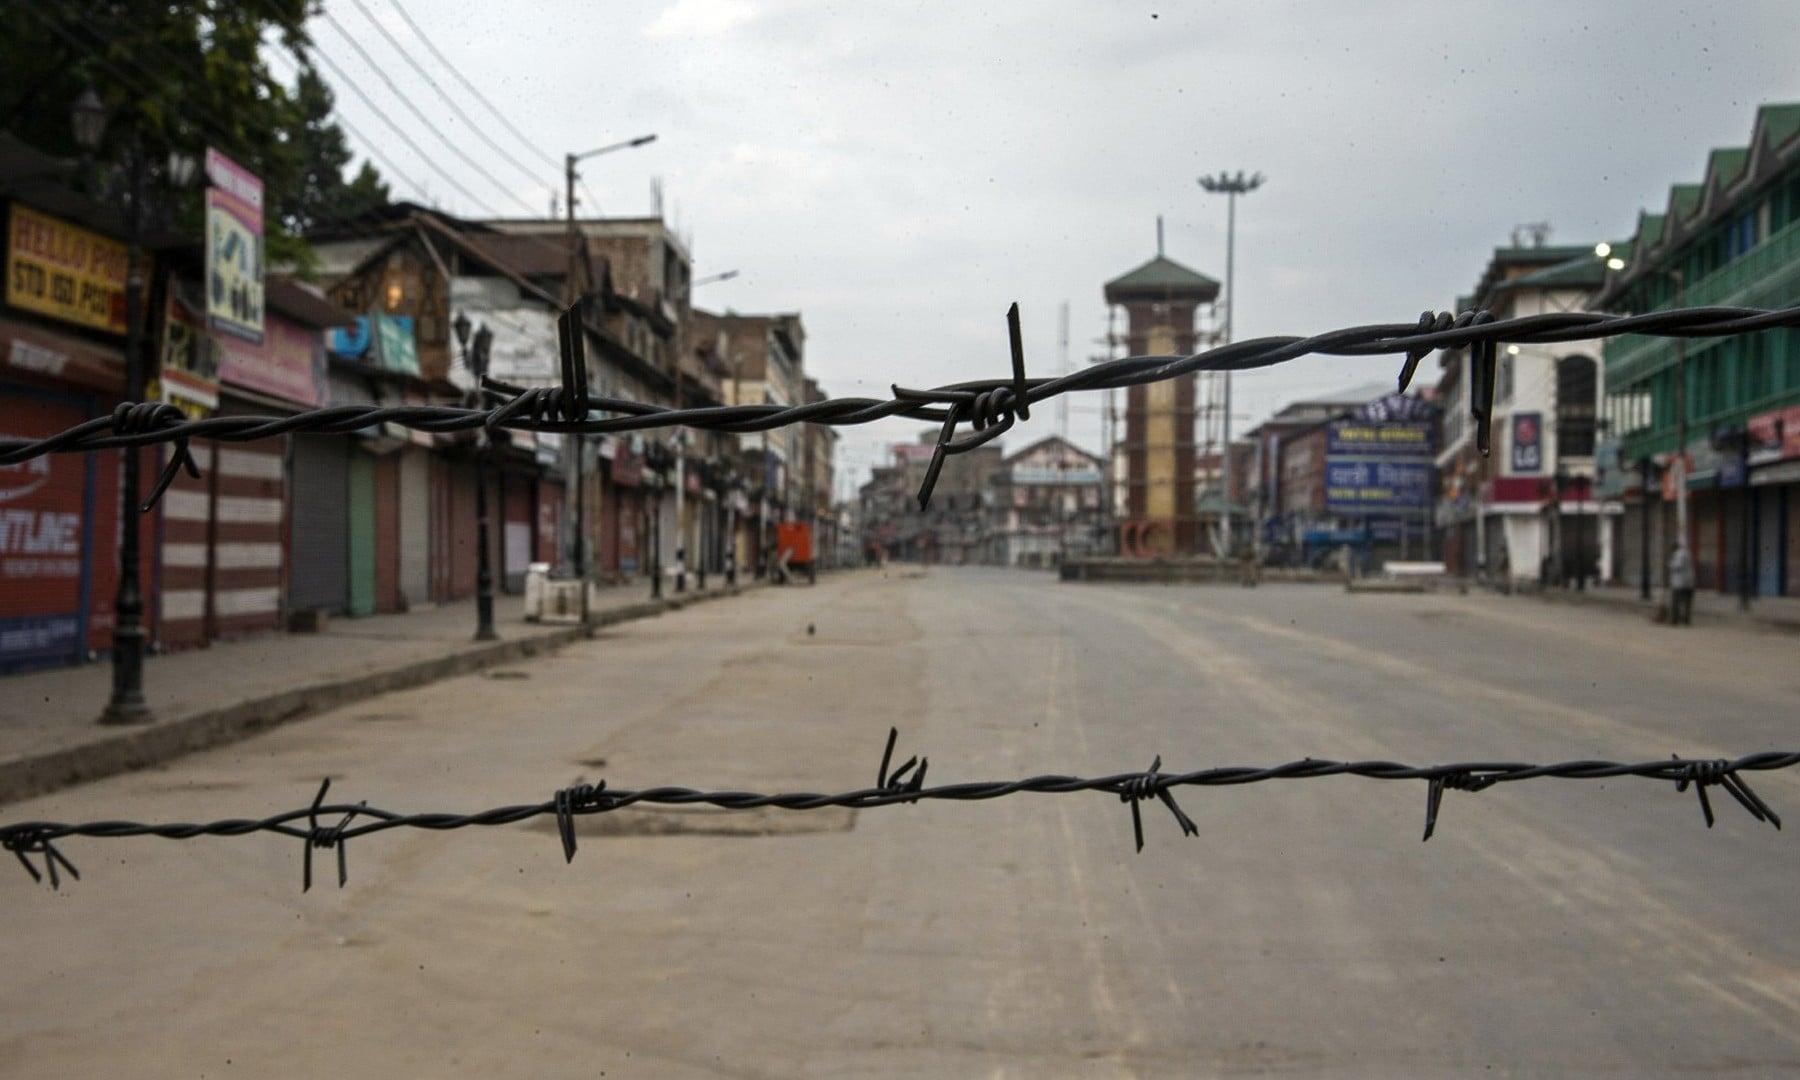 A deserted street is seen through barbwire set up as a blockade during curfew in Srinagar on August 6, 2019. — AP/Dar Yasin)